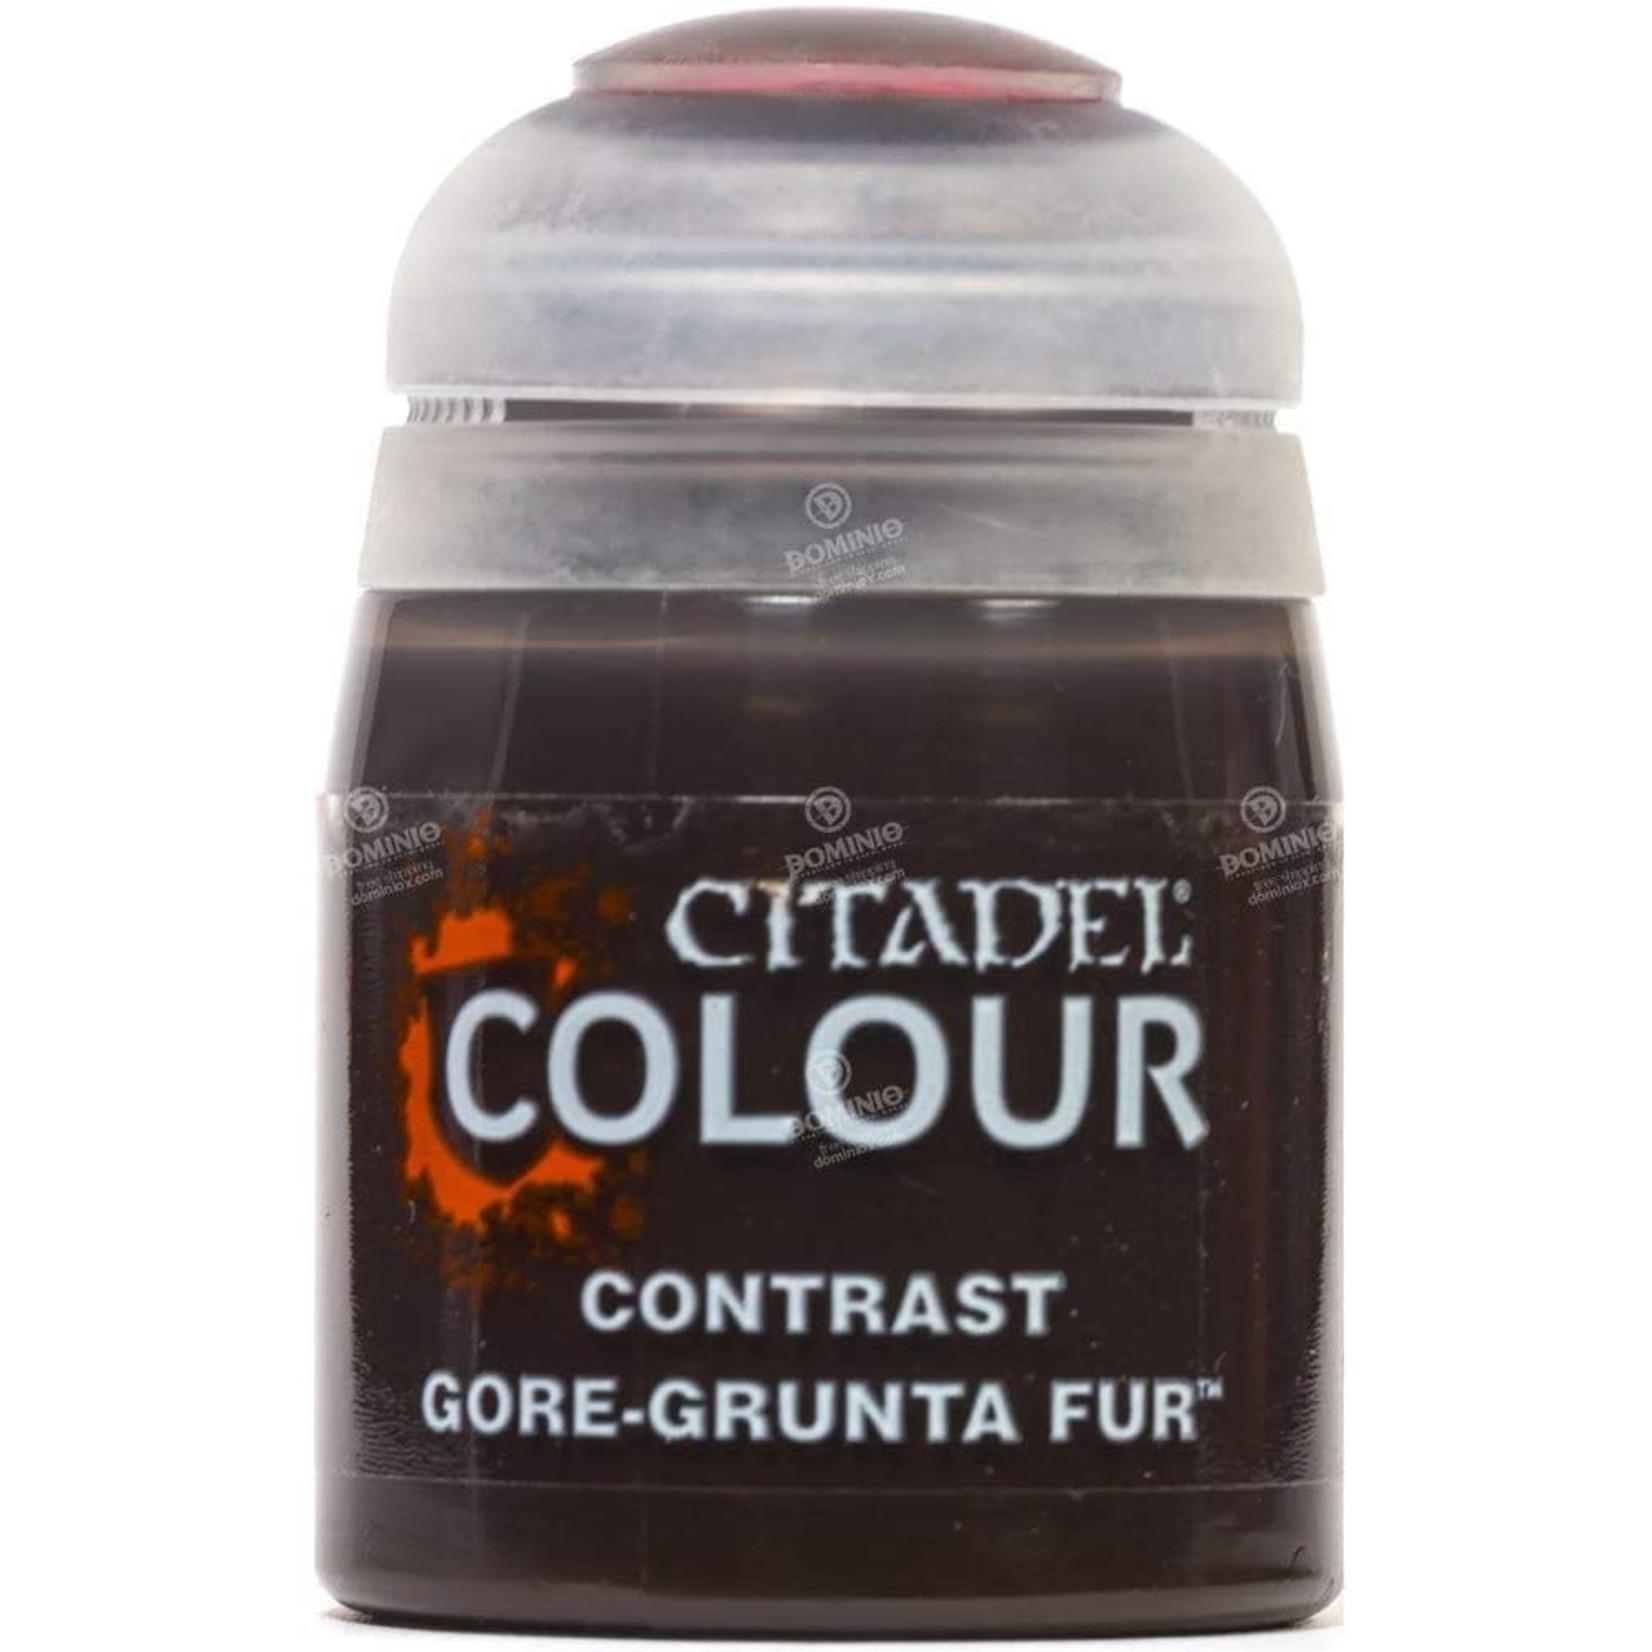 Games Workshop Citadel Paint: Gore-Grunta Fur Contrast (18 ml)